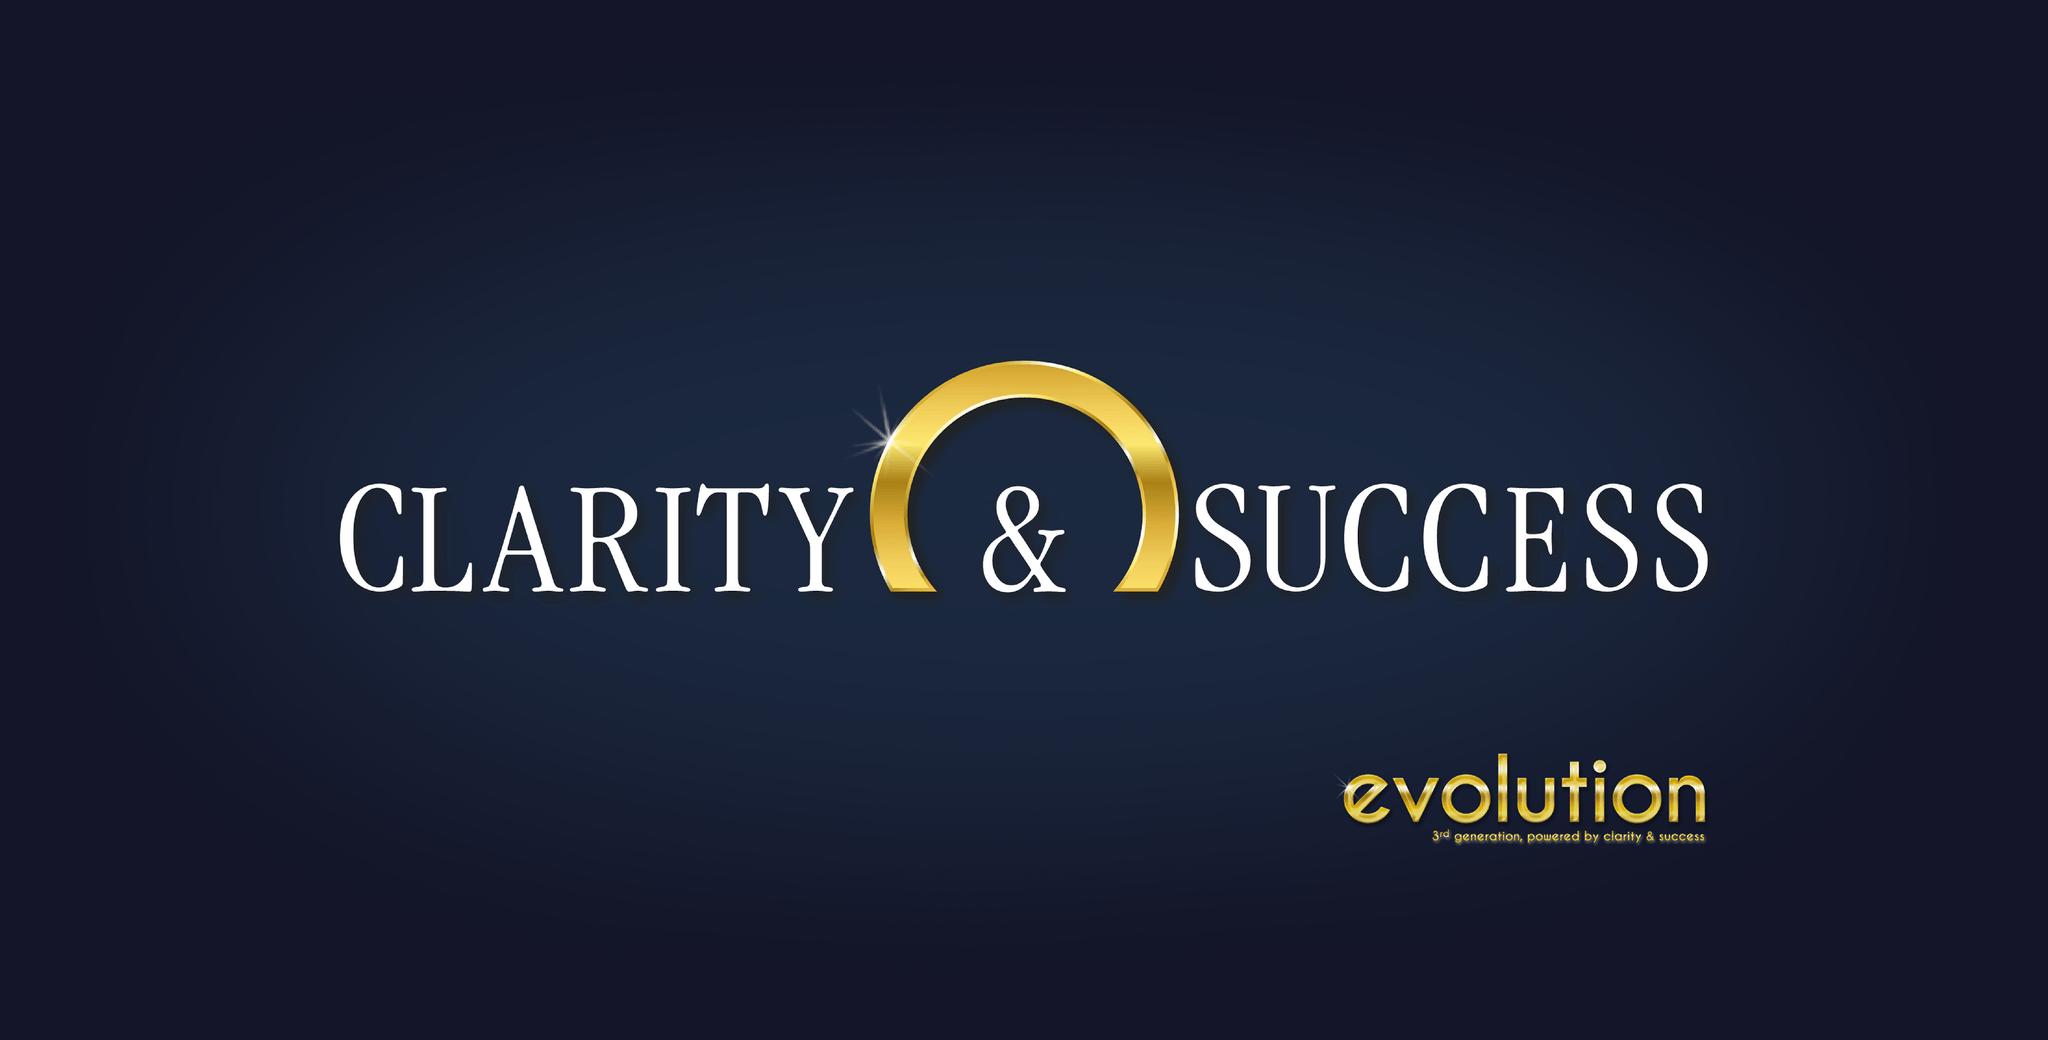 Clarity & Success